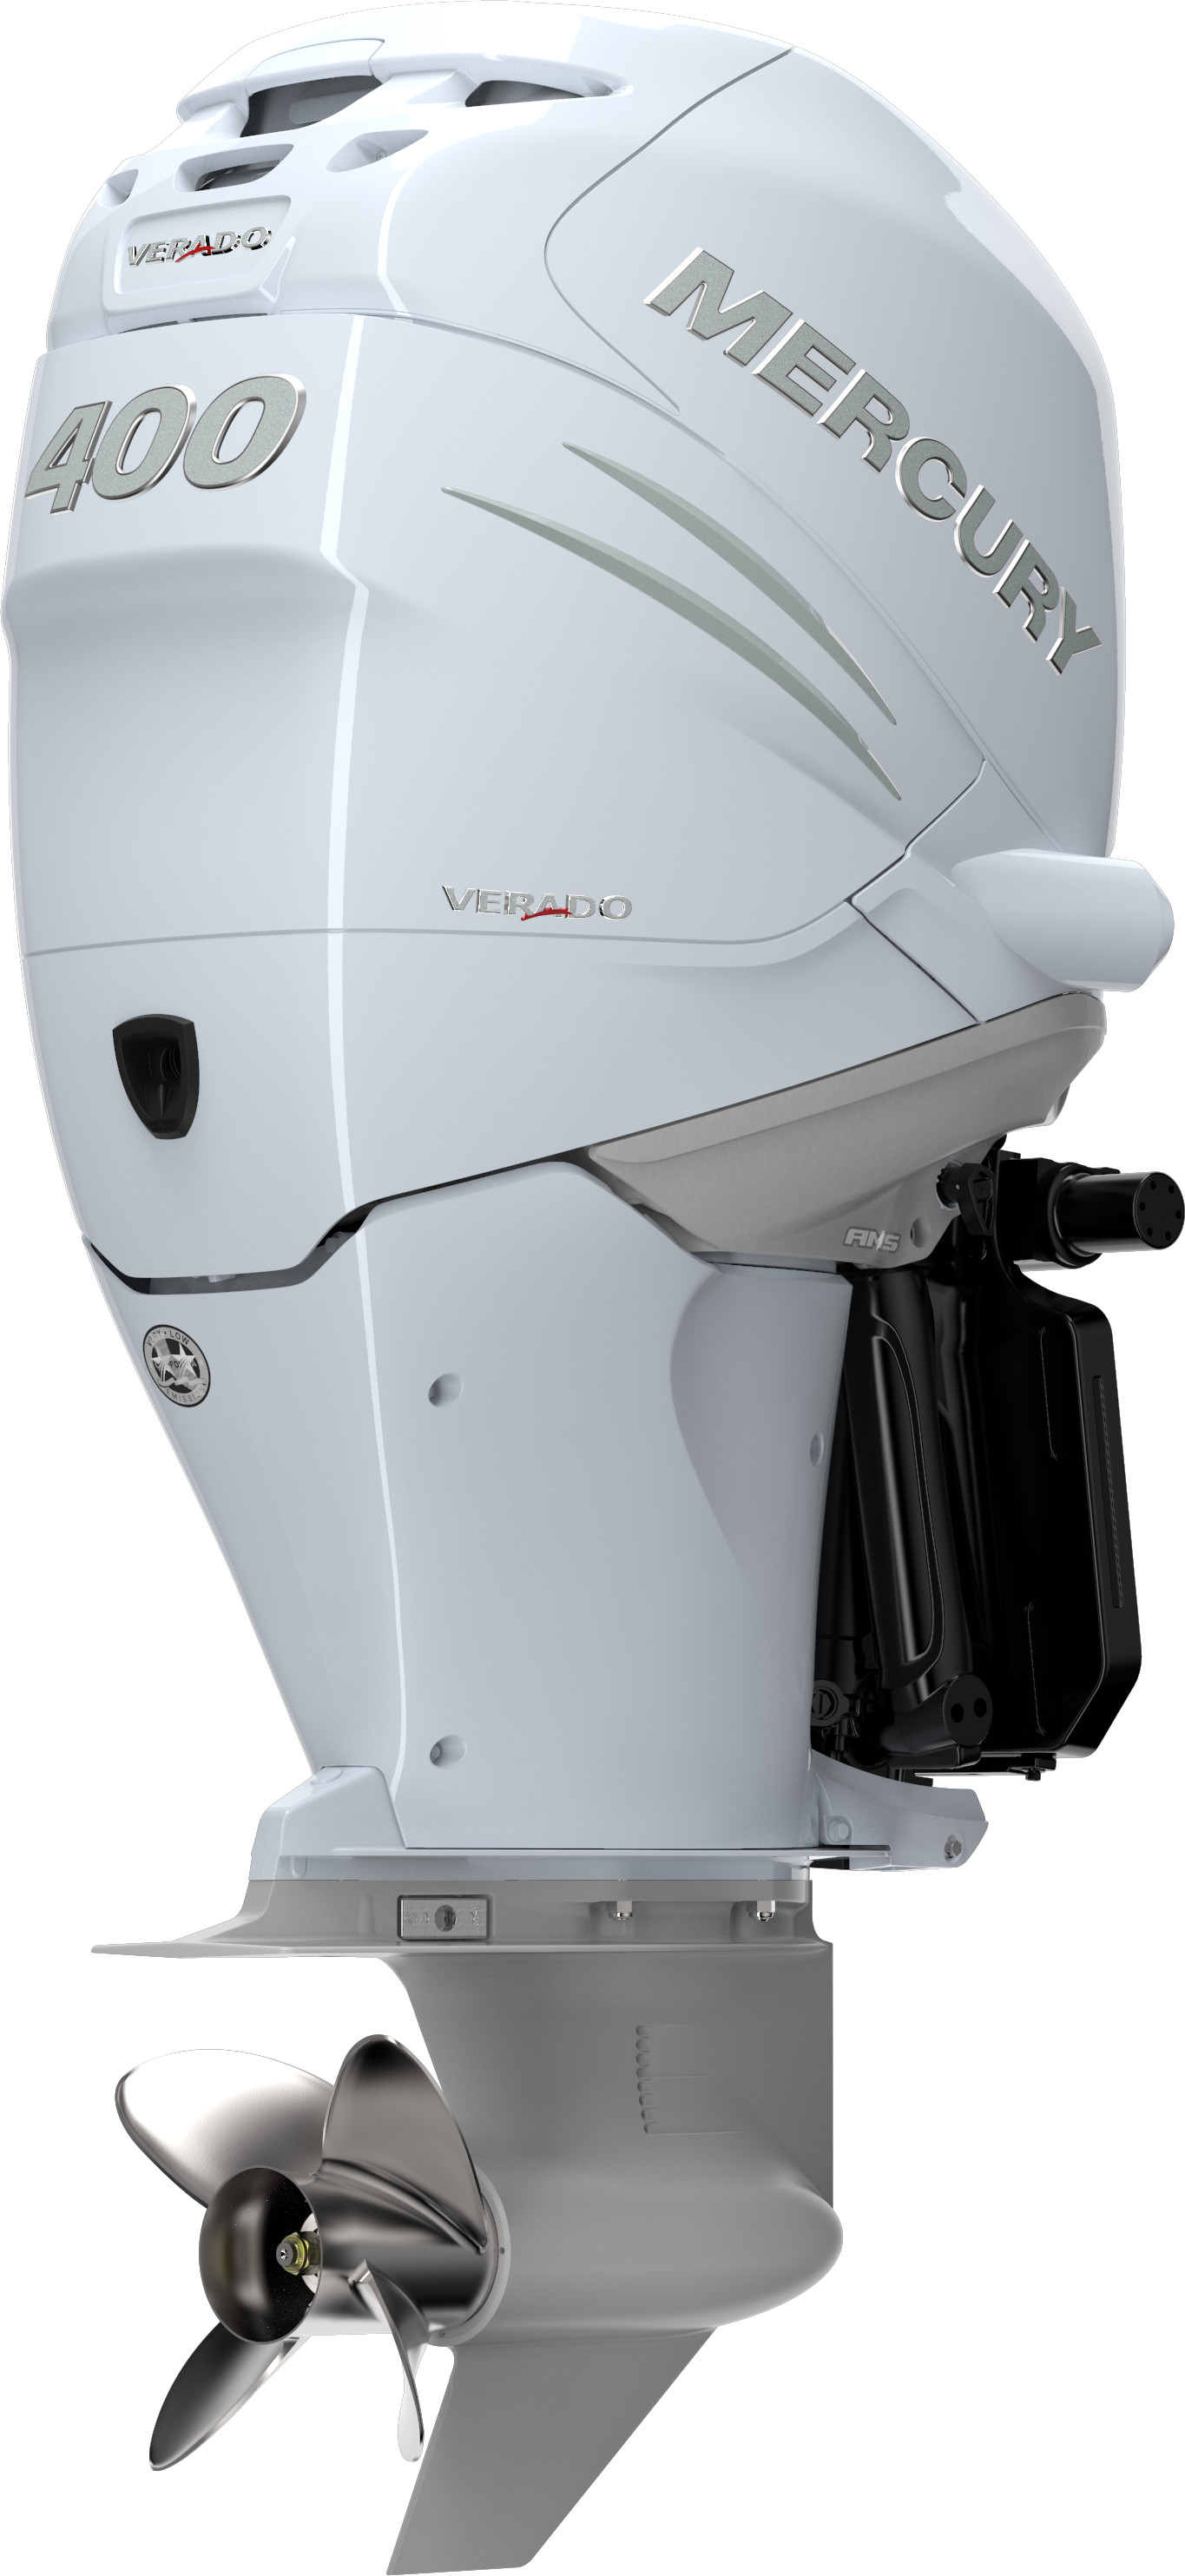 6 merc new 400R.jpg